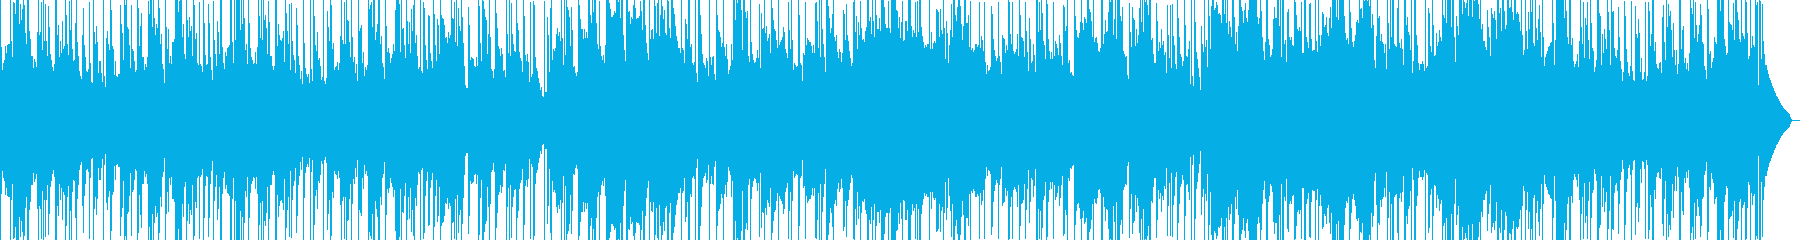 Lofi Chill なチルポップの再生済みの波形